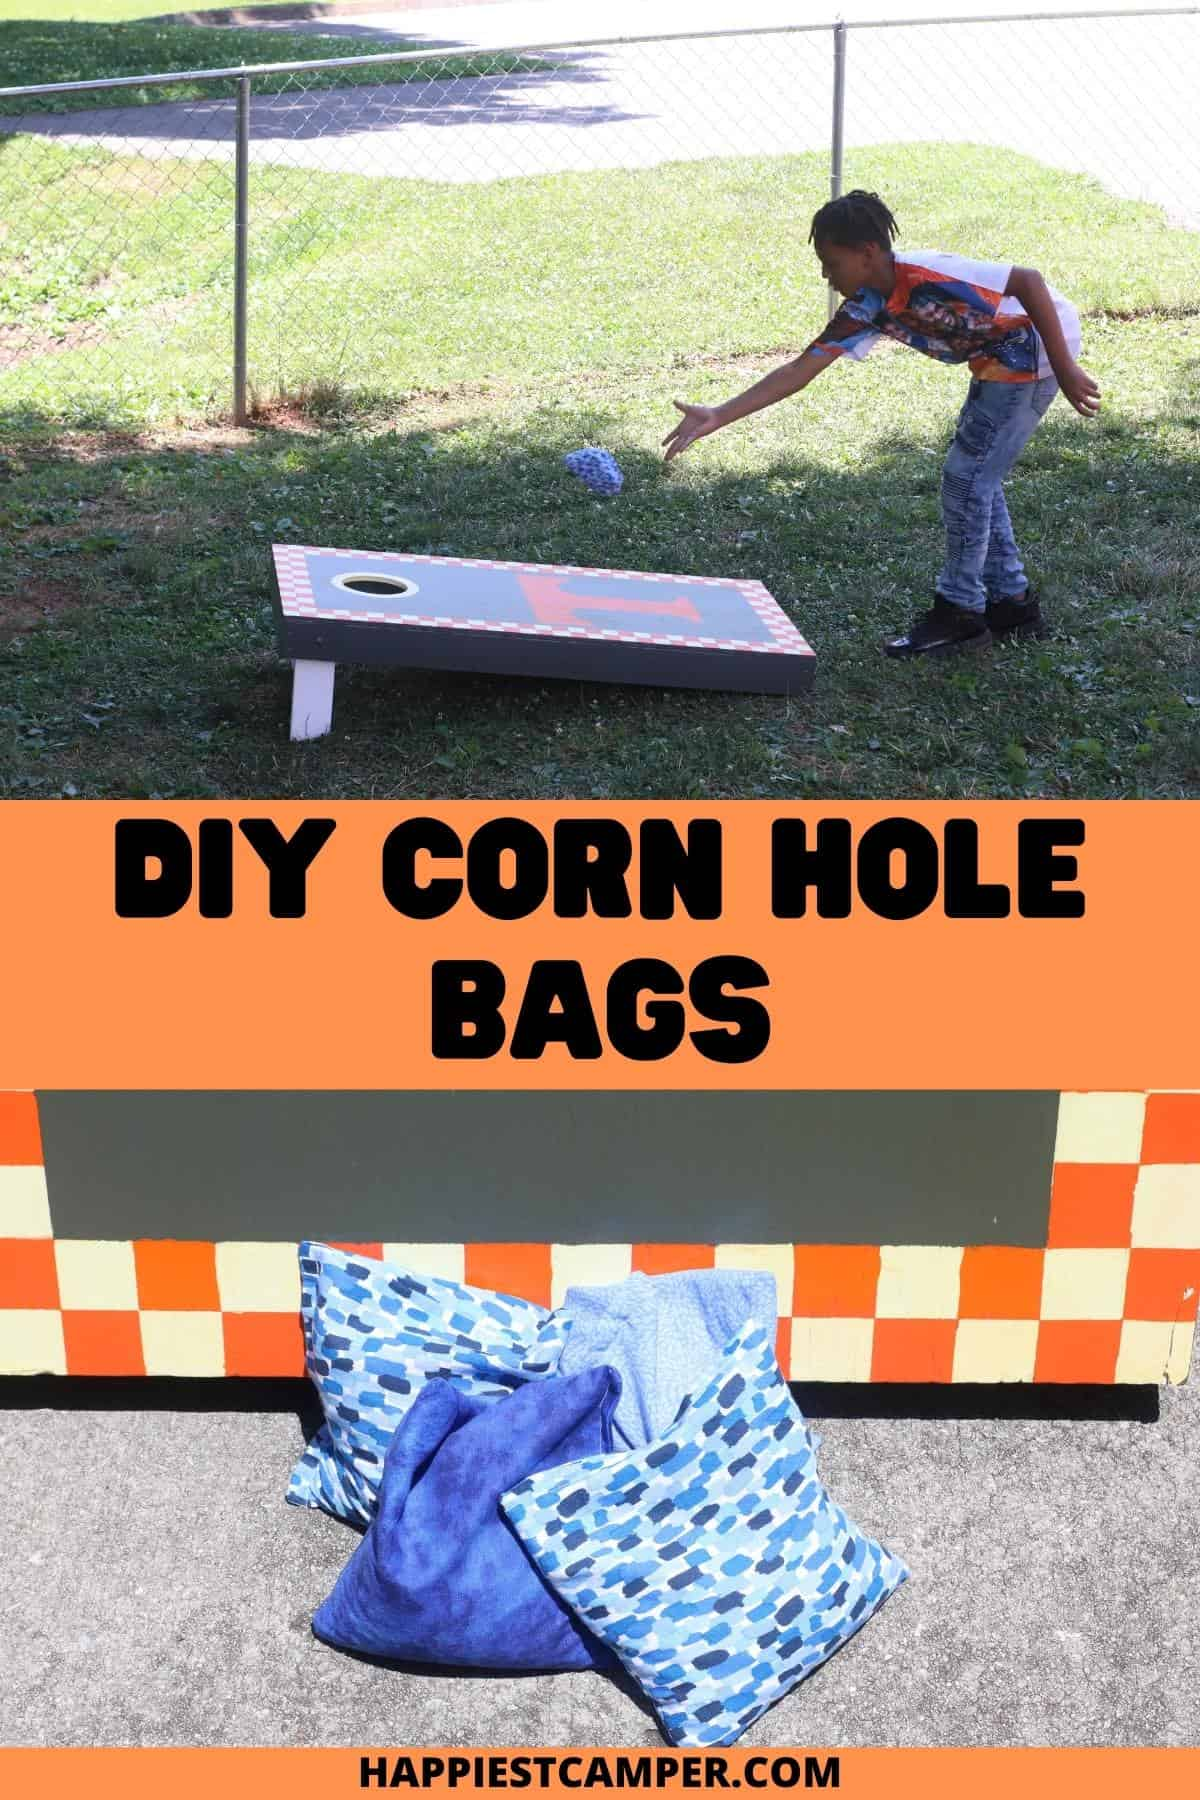 DIY Corn Hole Bags